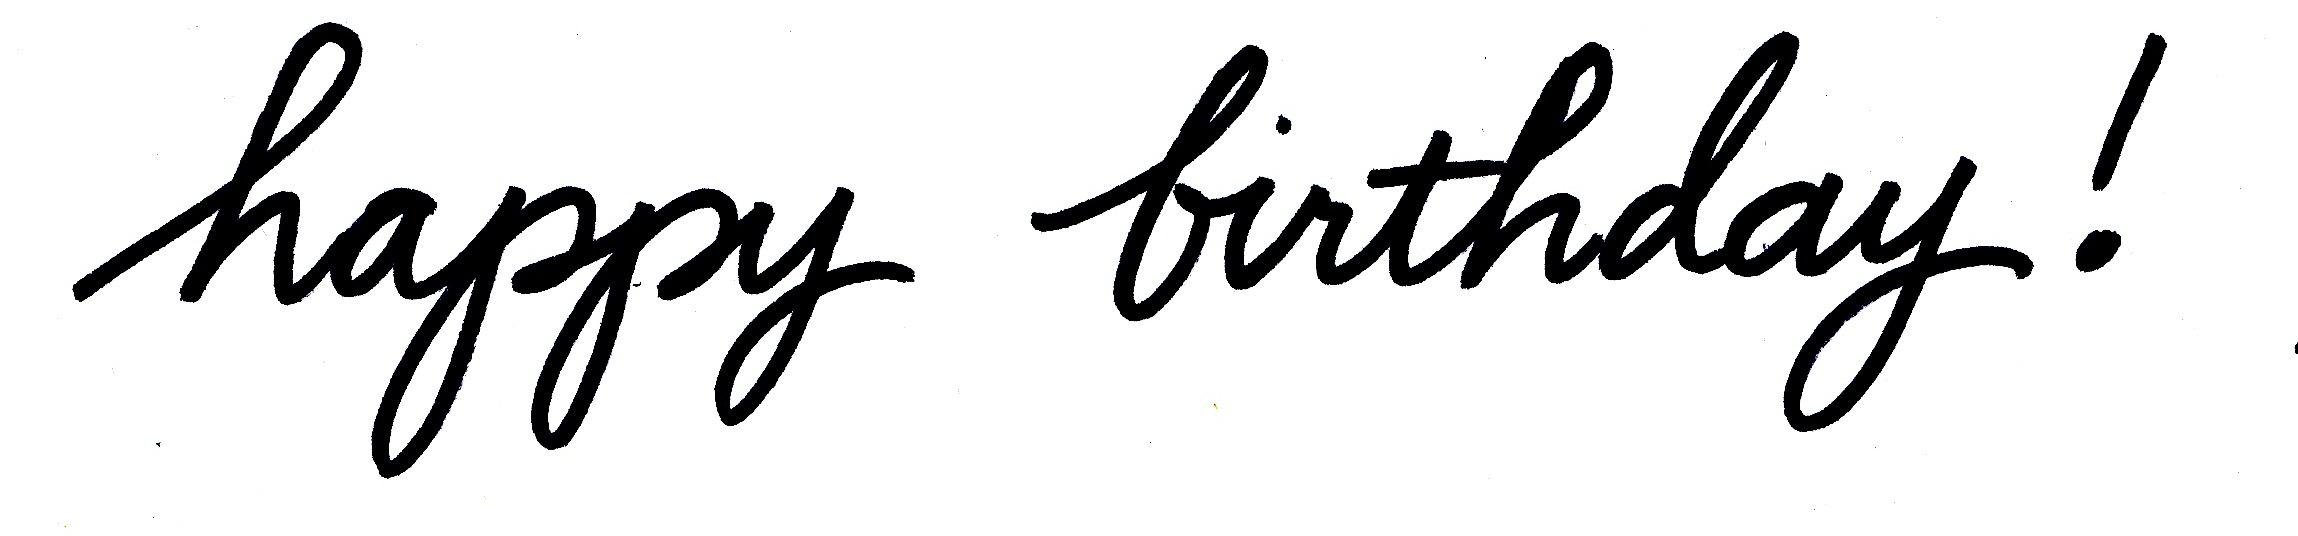 Calligraphy Handwritten Life